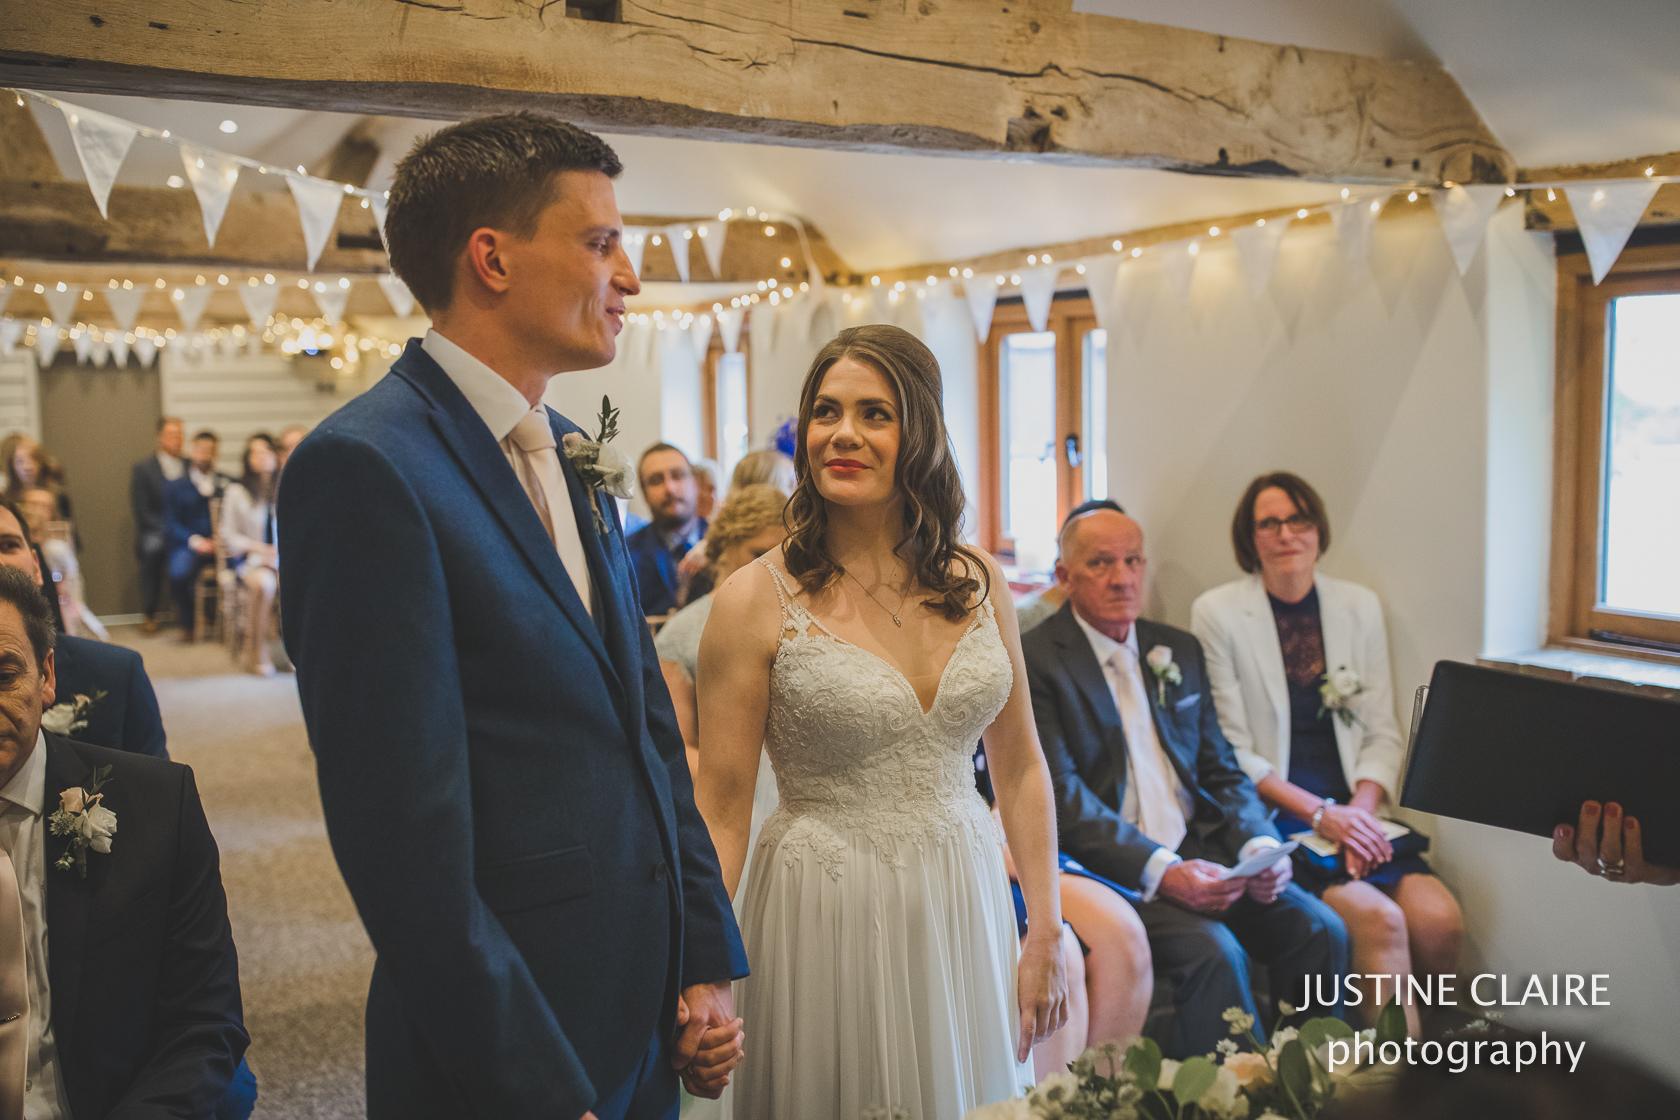 Fitzleroi Fittleworth petworth Billingshurst farm Wedding Photography by Justine Claire photographer Arundel Worthing Brighton-18.jpg